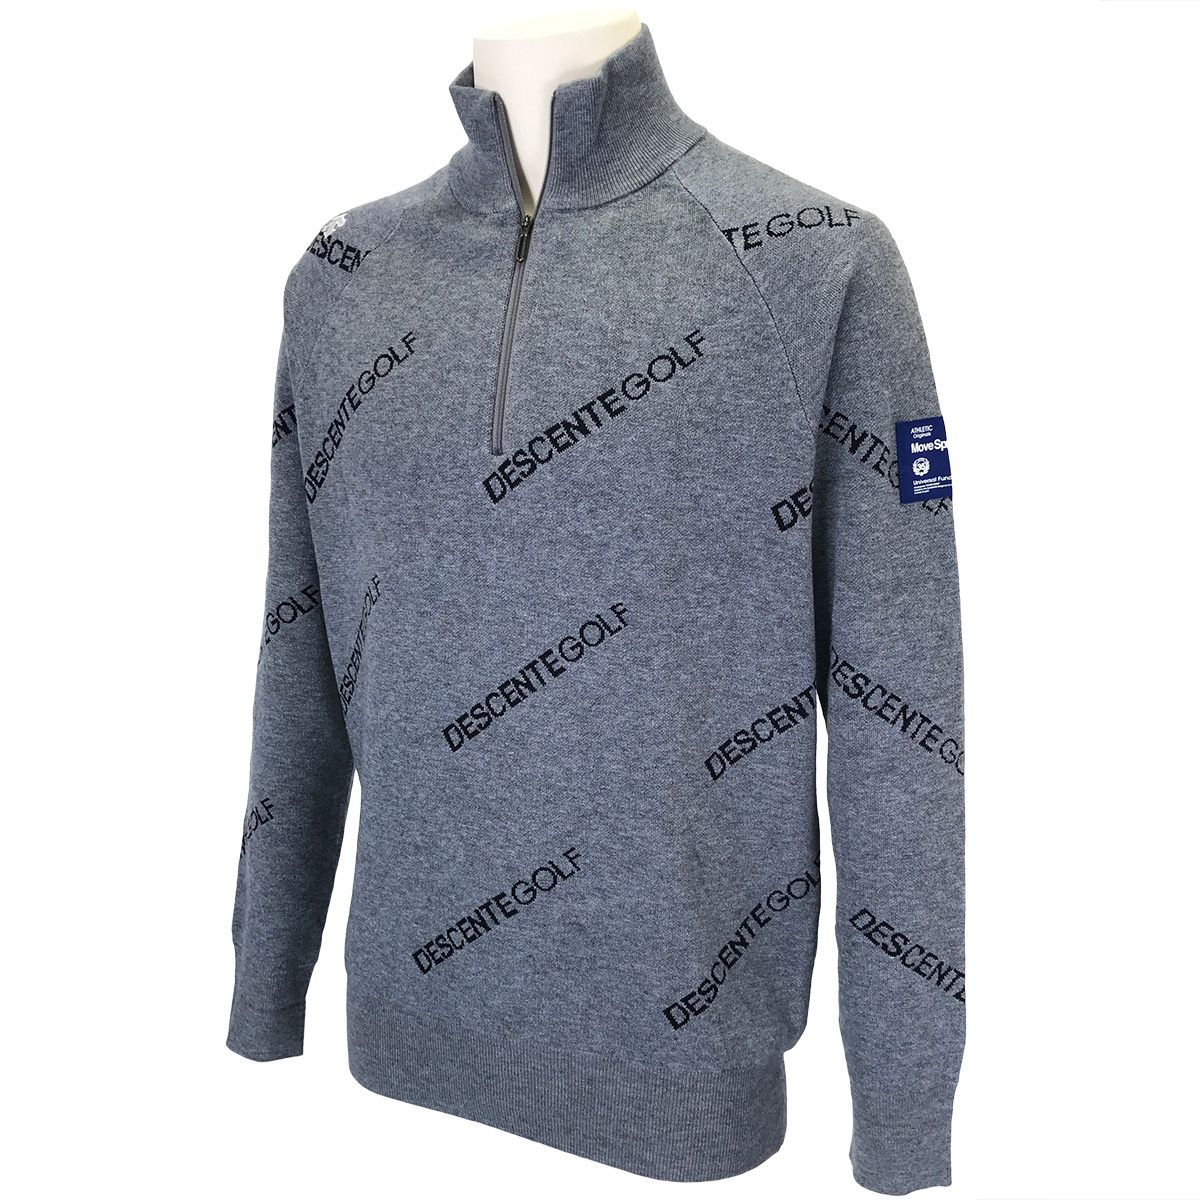 BLUELABEL ウール混ロゴジャカードセーター